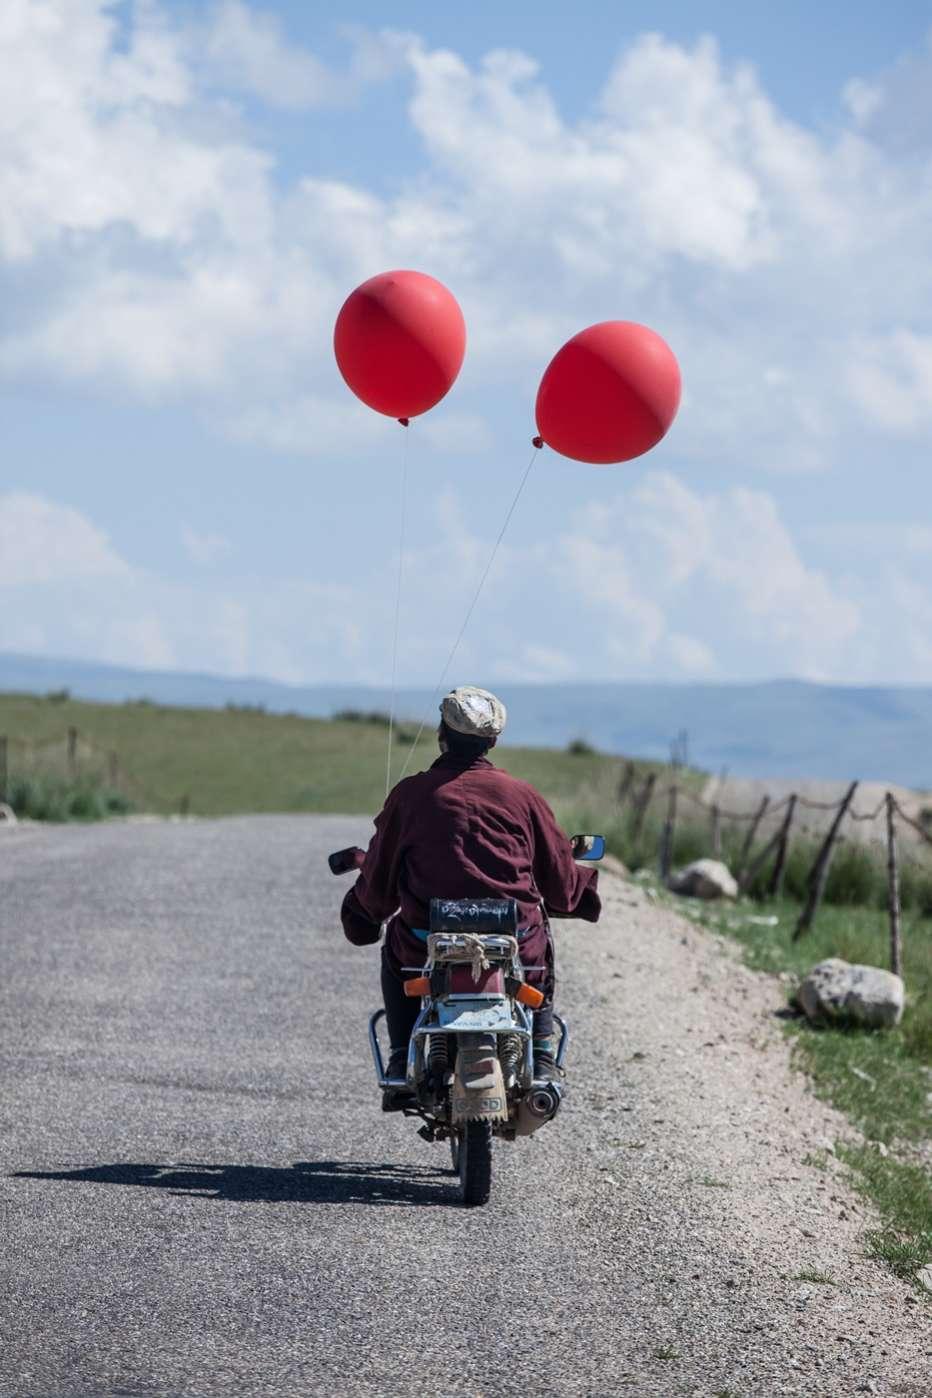 Balloon-2019-Pema-Tseden-003.jpg